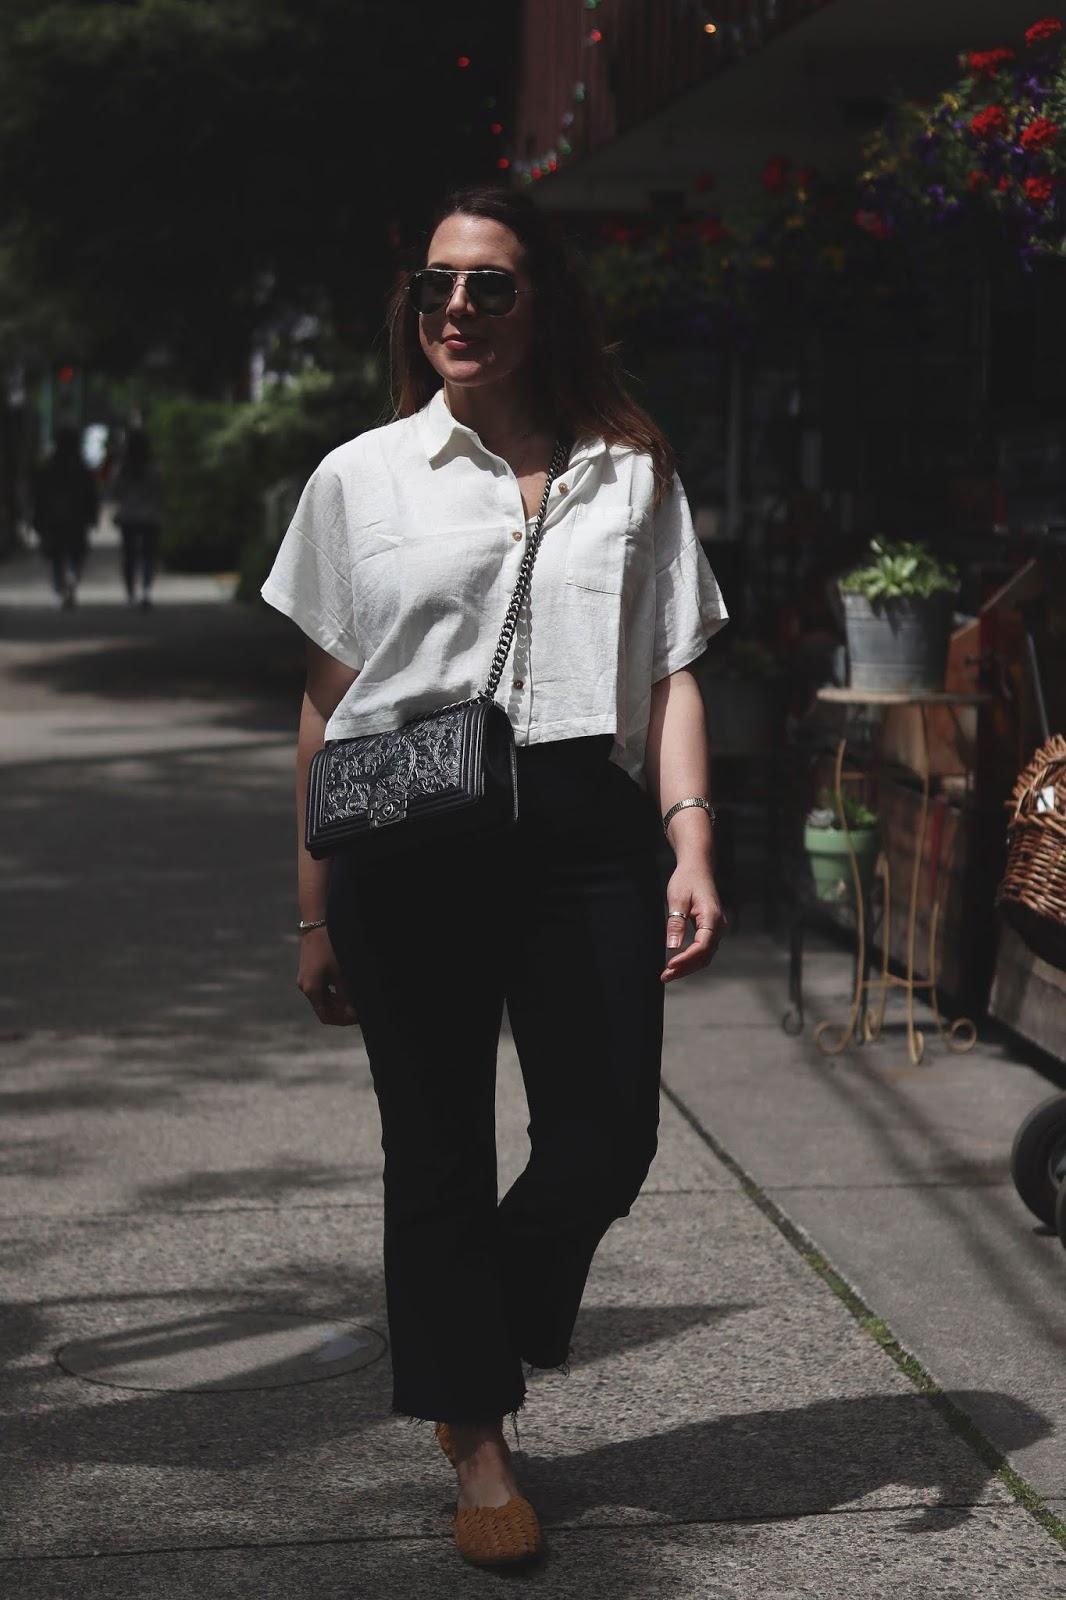 levis ribcage jean blogger outfit linen shirt vancouver fashion blogger chanel boy bag